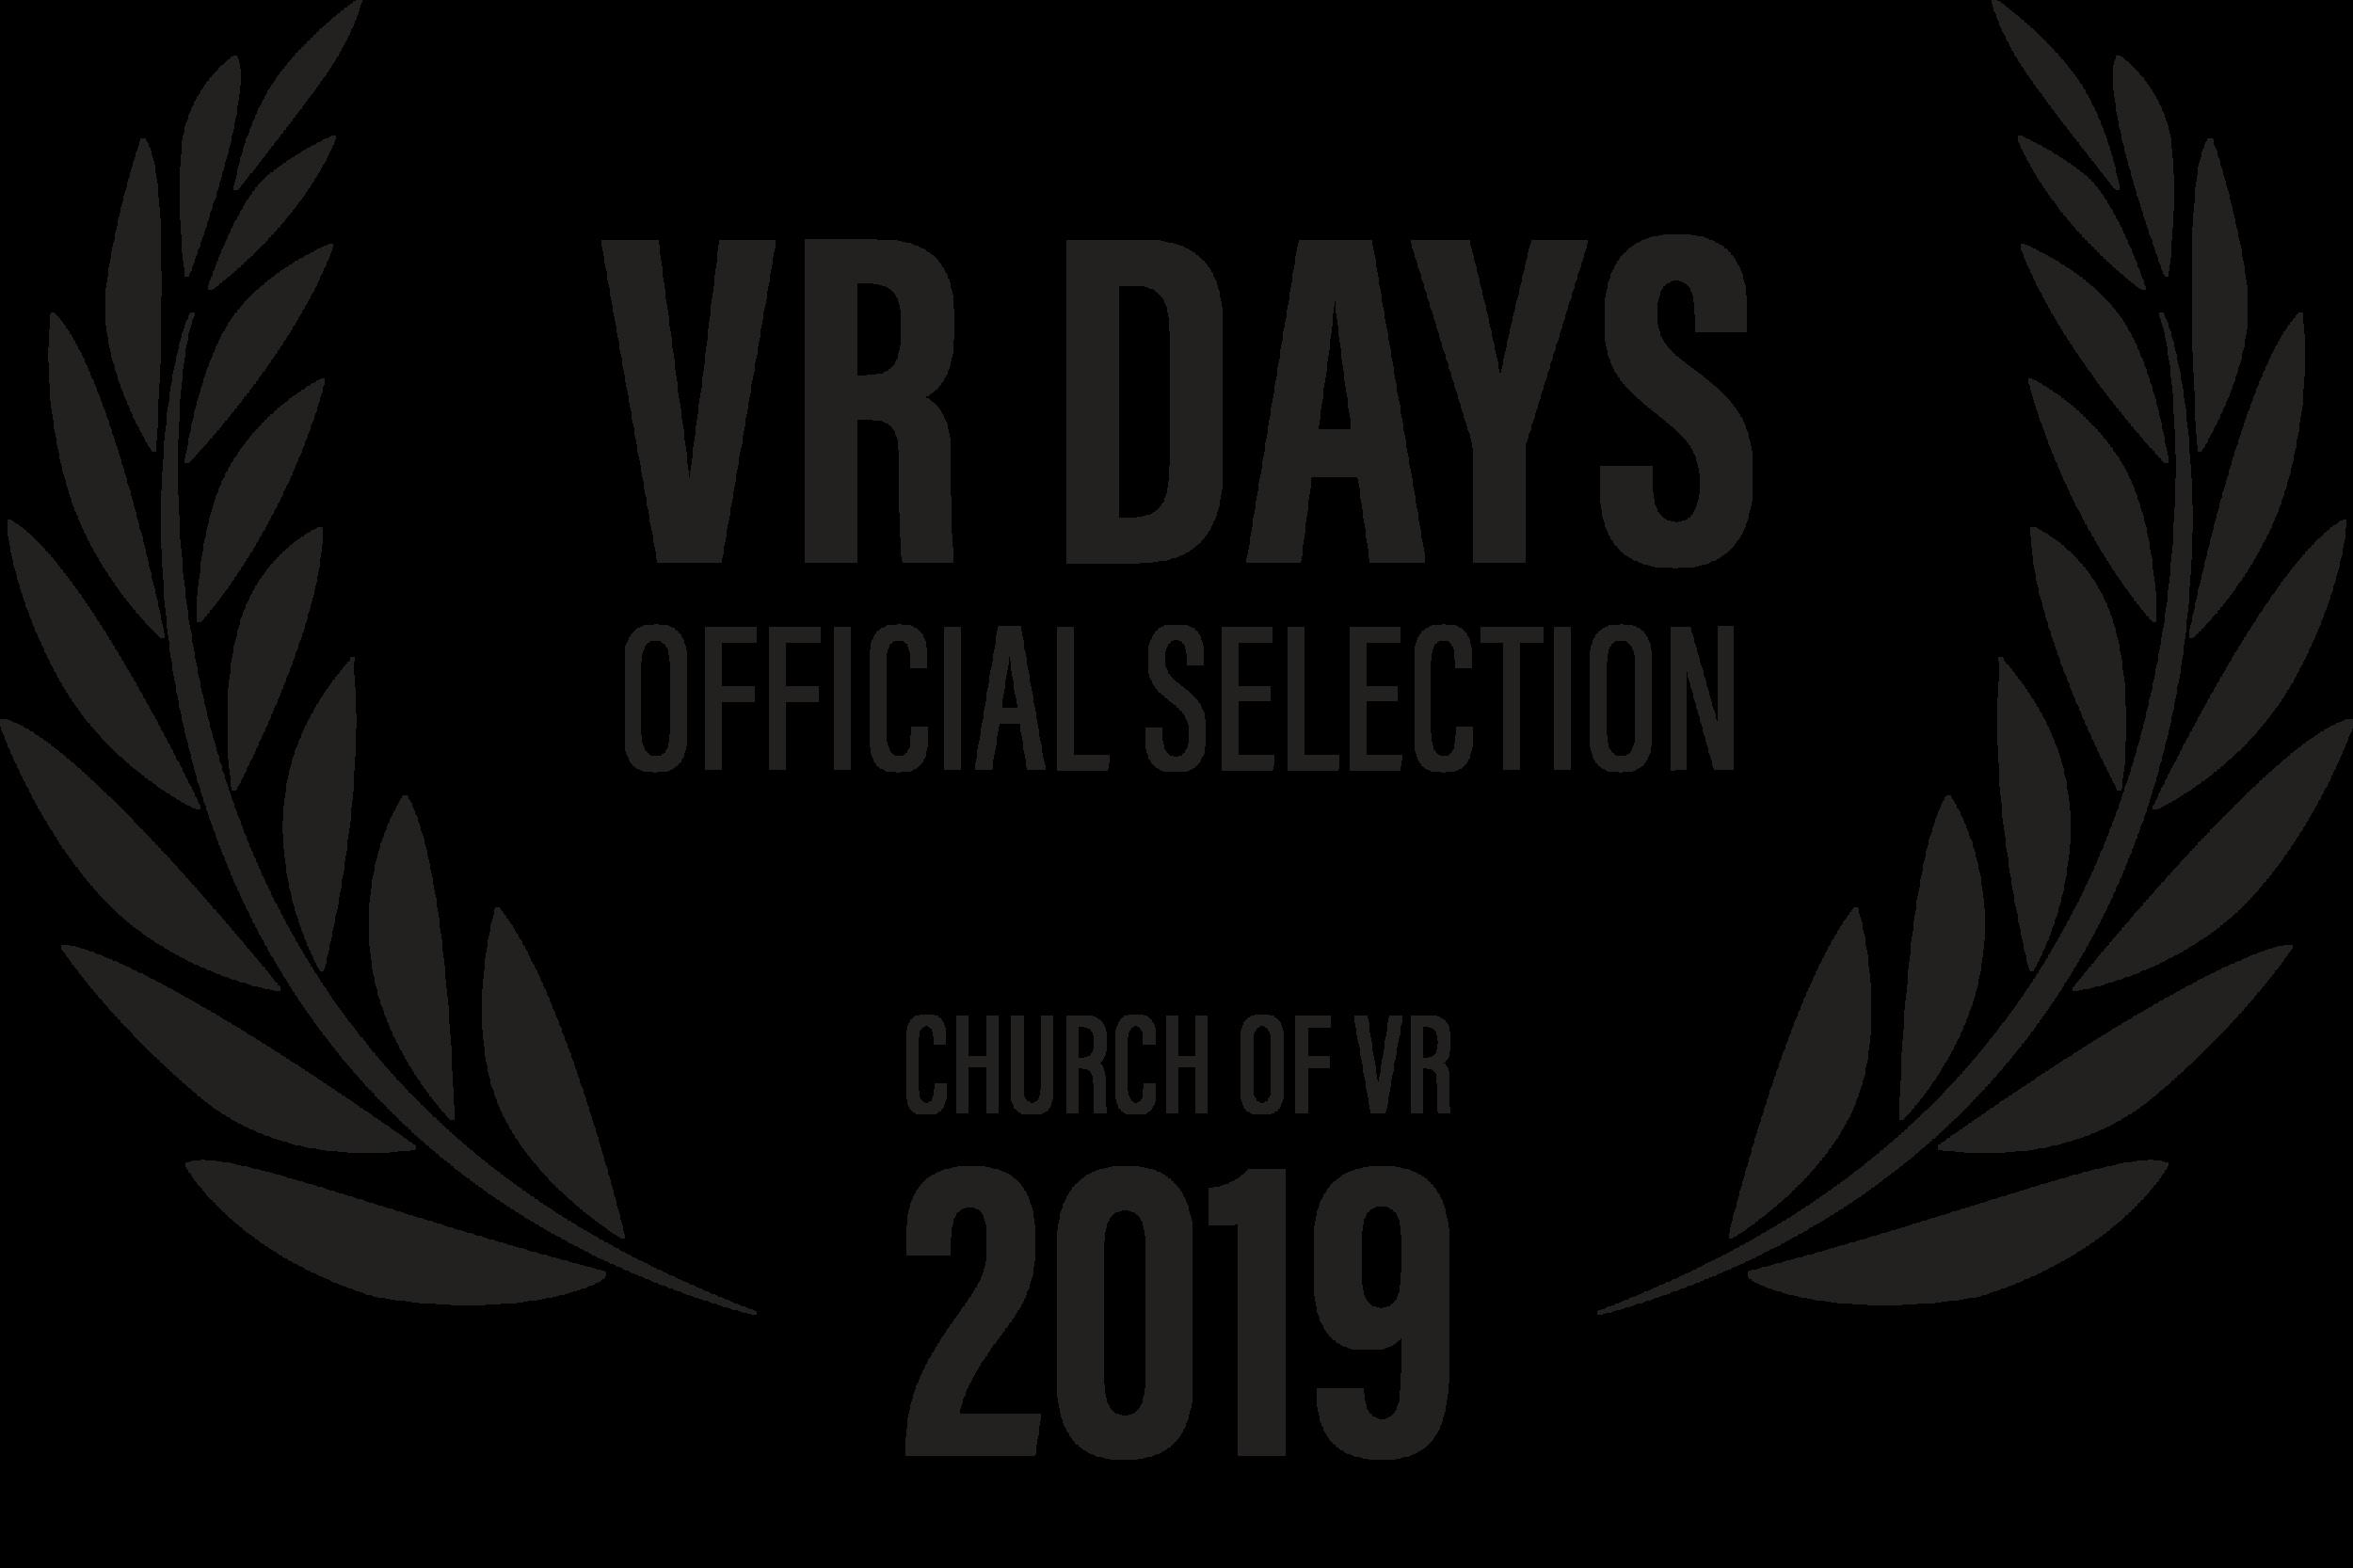 Church_of_vr_logo_new_font_2019_black.png